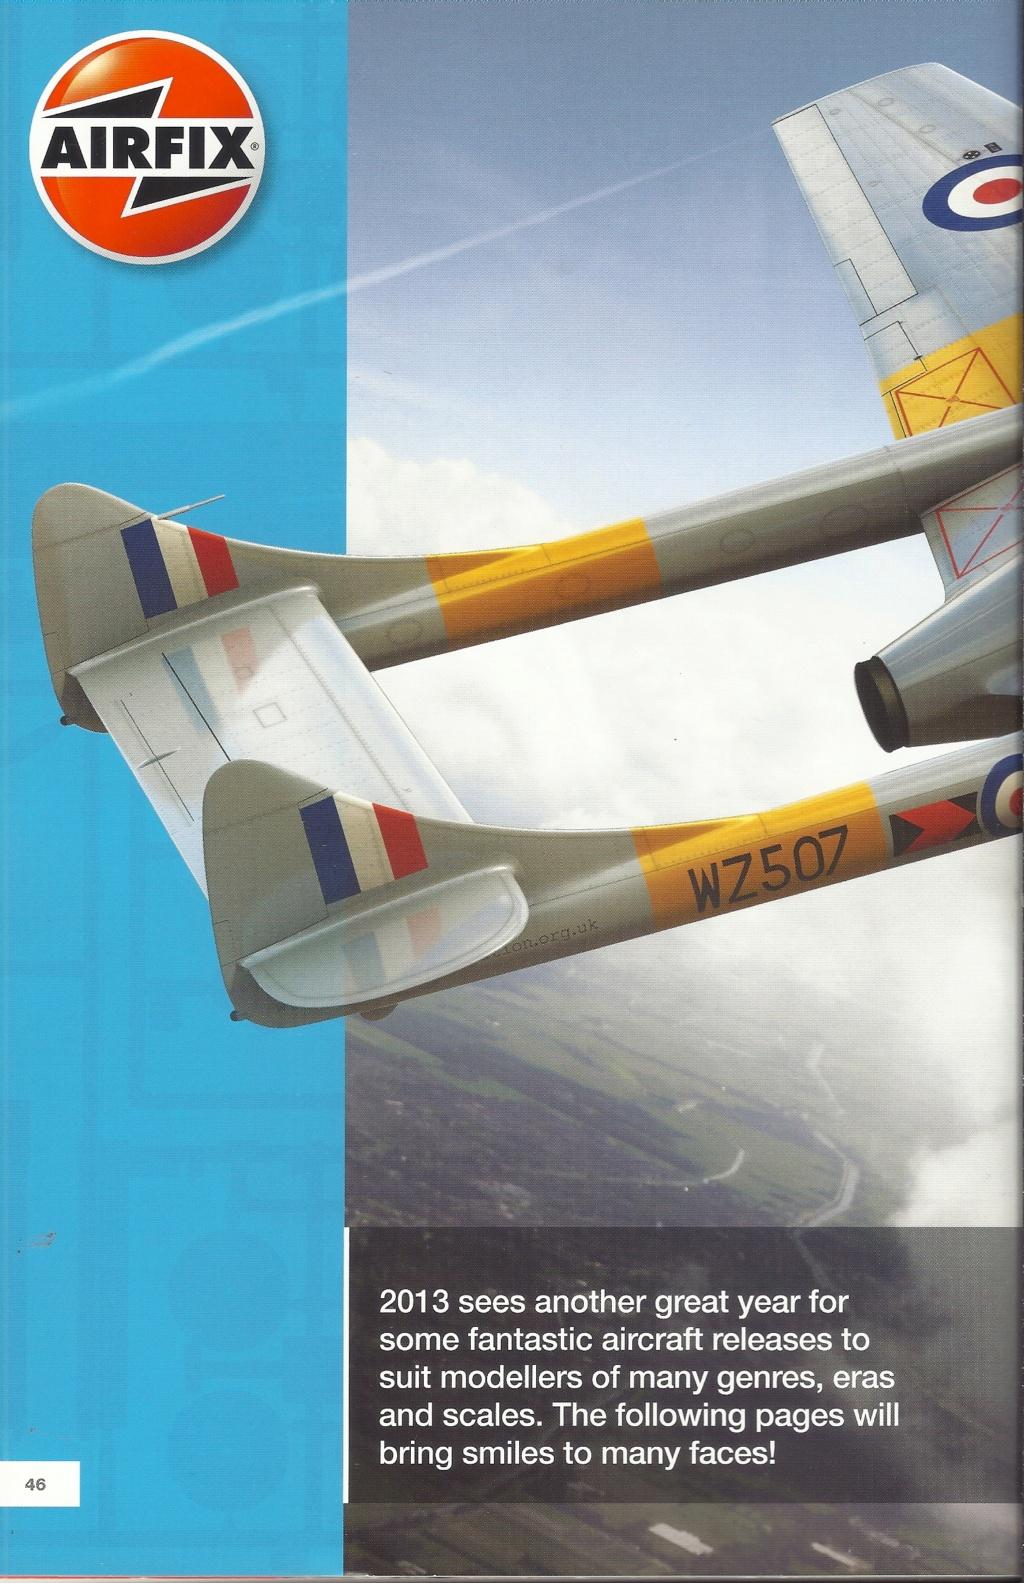 [AIRFIX 2013] Catalogue 2013 Airf1499